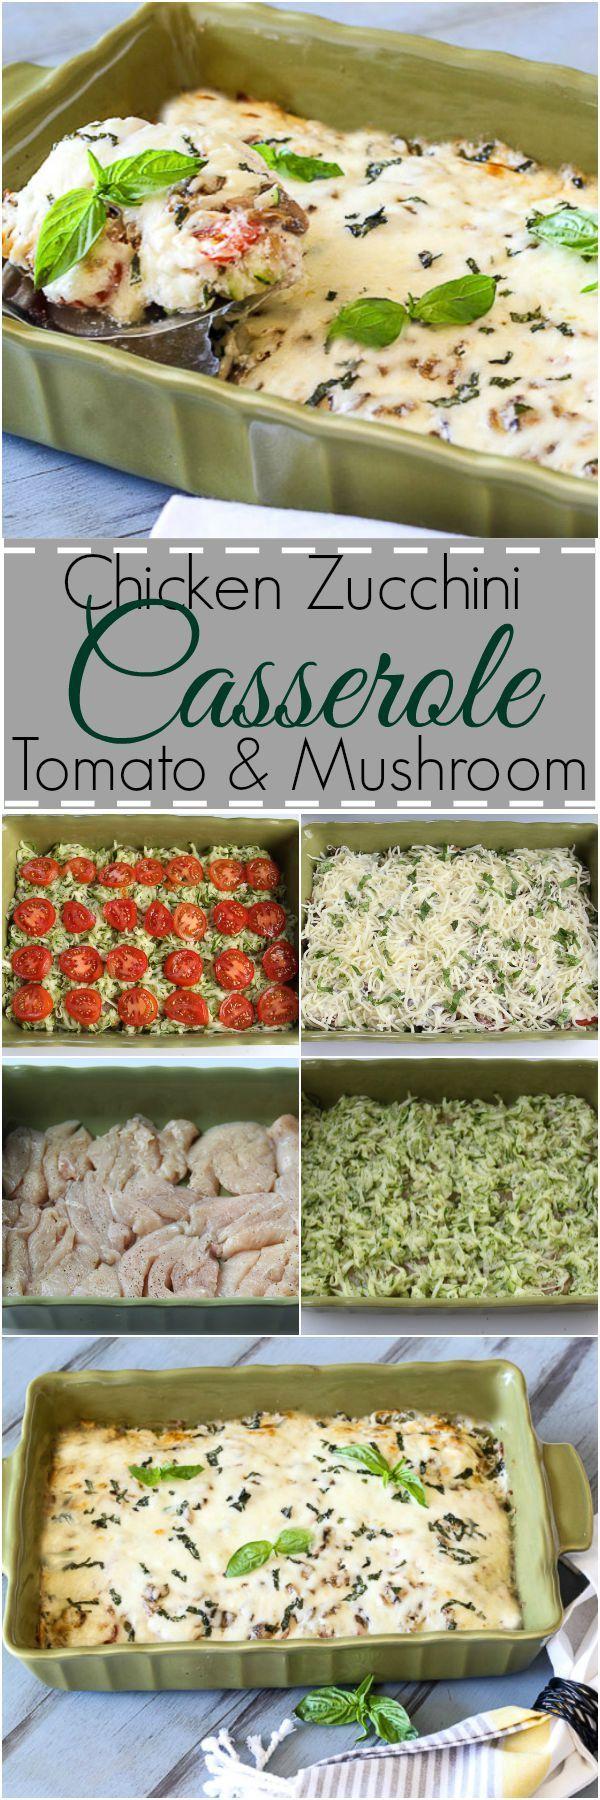 Chicken, Zucchini, Tomato, Mushroom and Cheese Casserole. ValentinasCorner.com